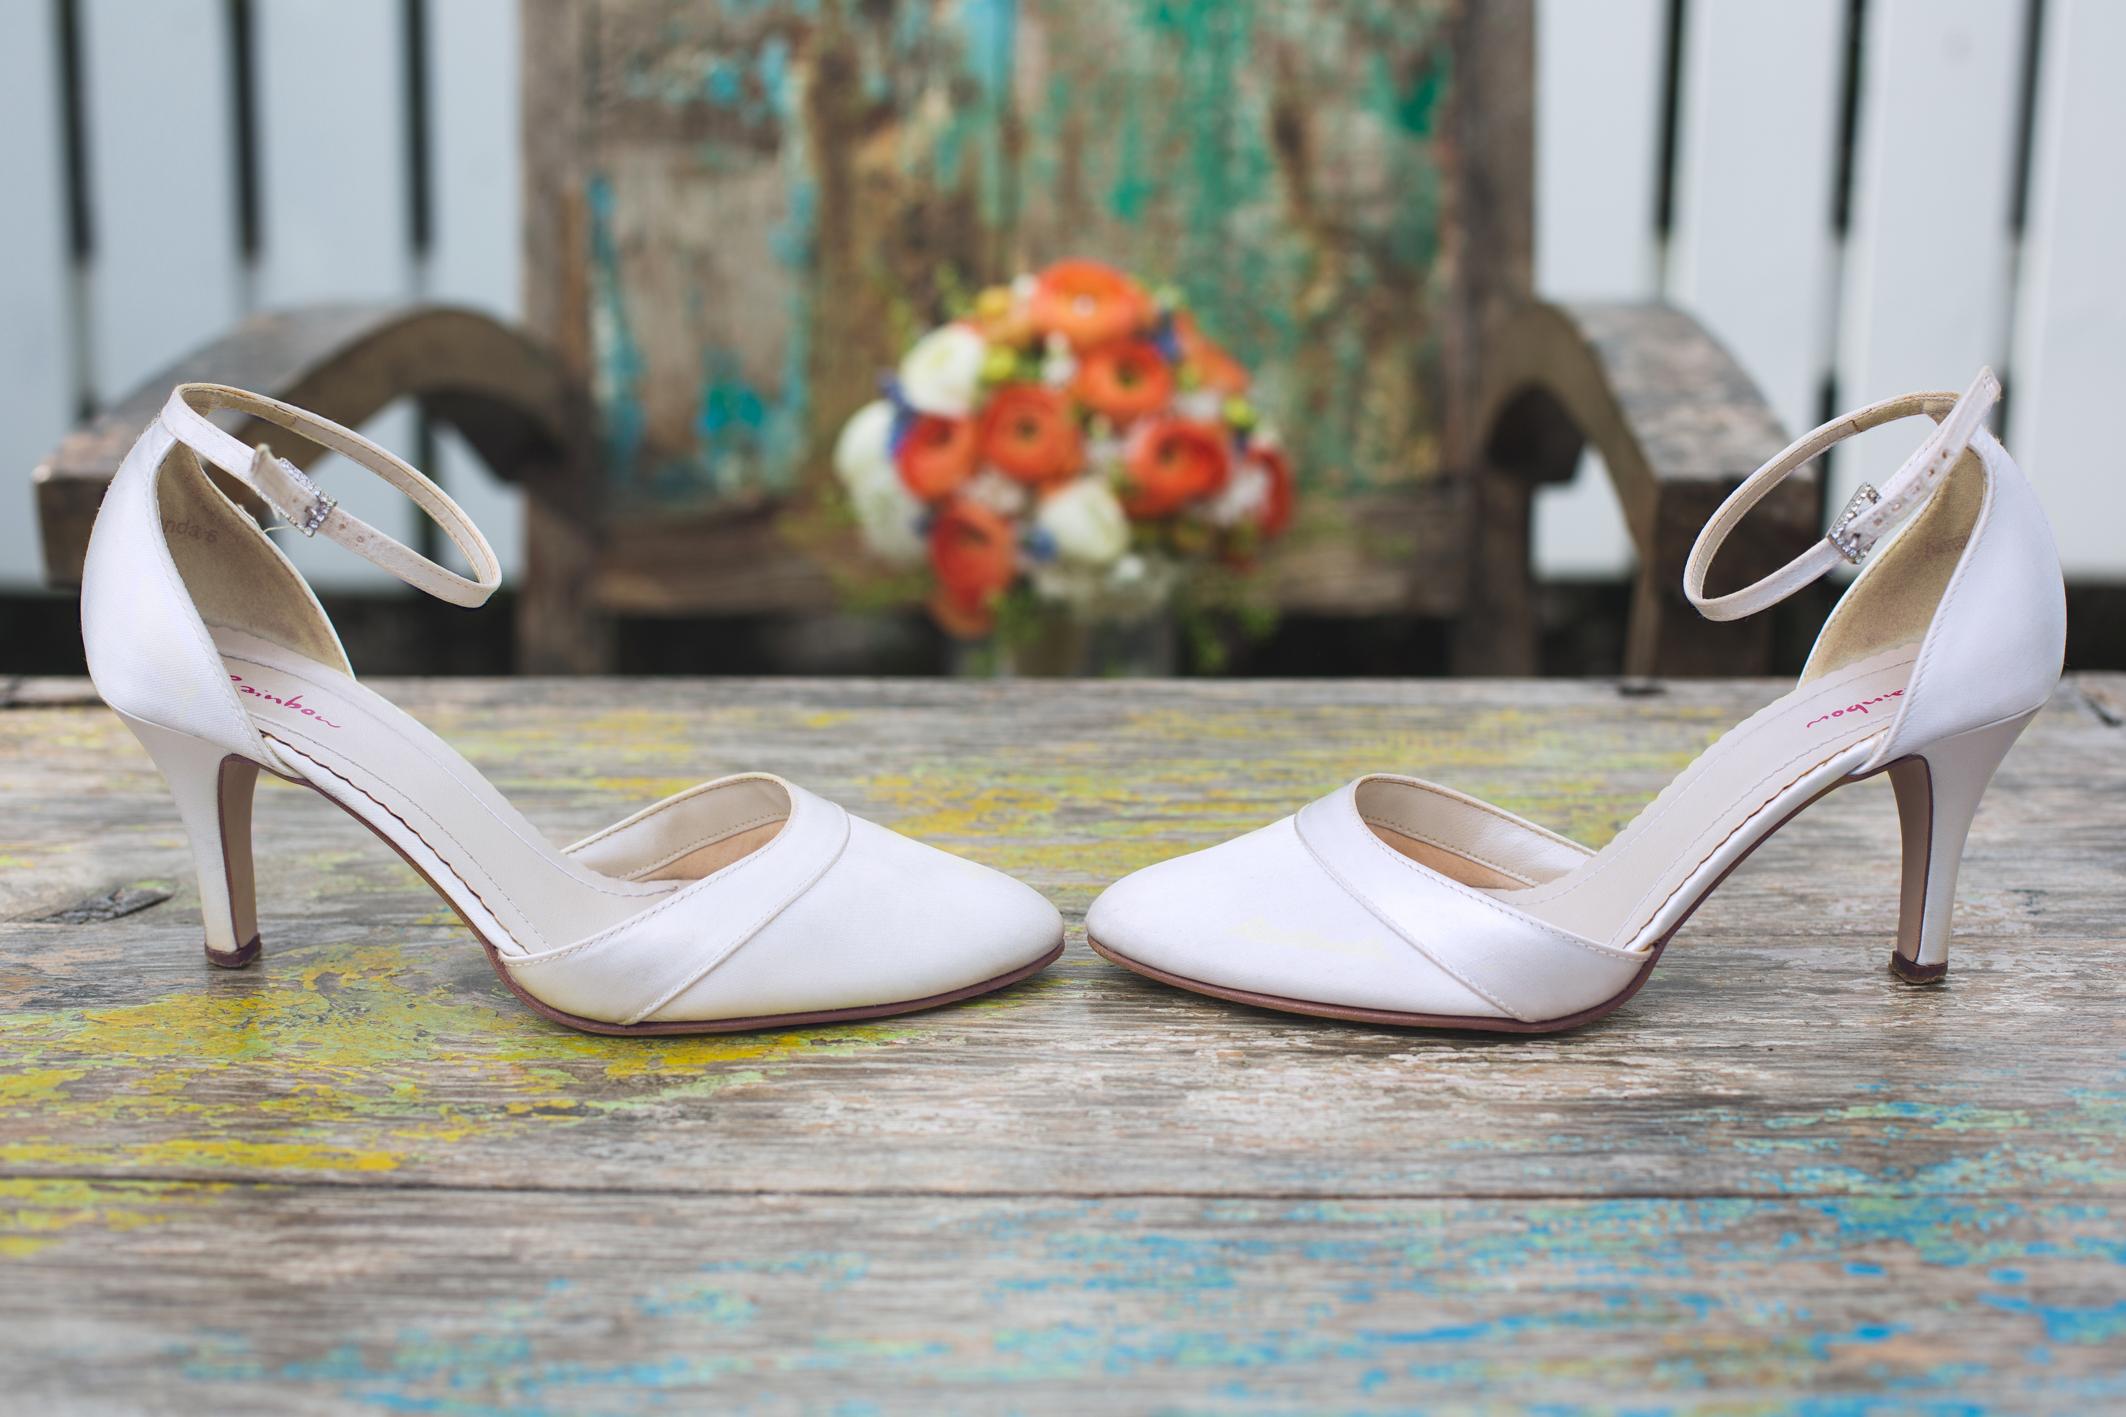 TINY WEDDINGS – EIN TREND